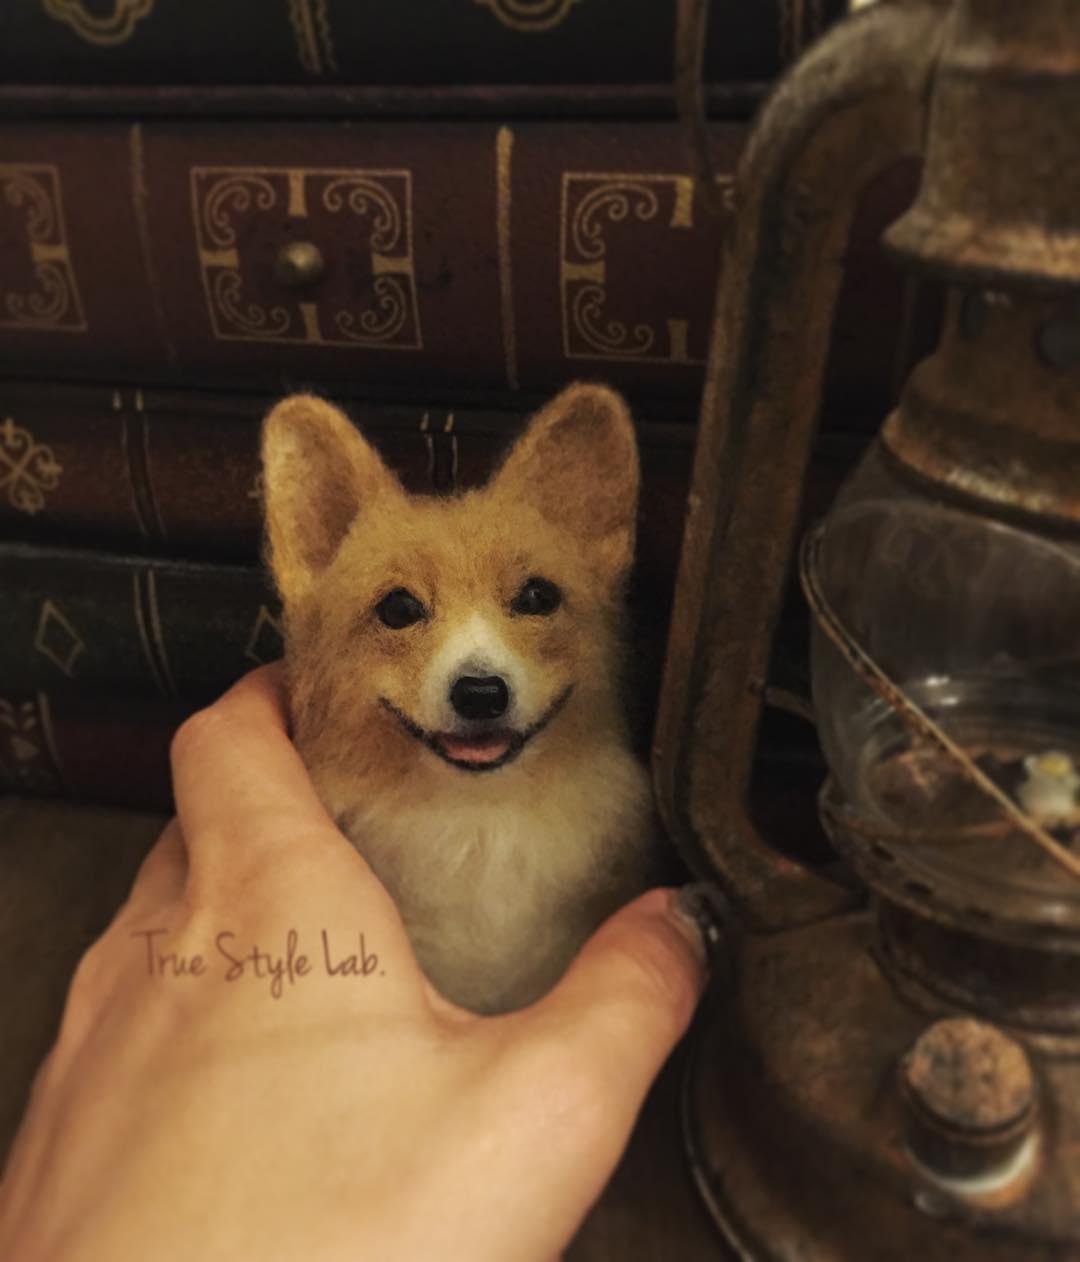 08-Corgi-Dog-Terumi-Ohta-Giving-Life-to-Woollen-Animal-Sculptures-www-designstack-co